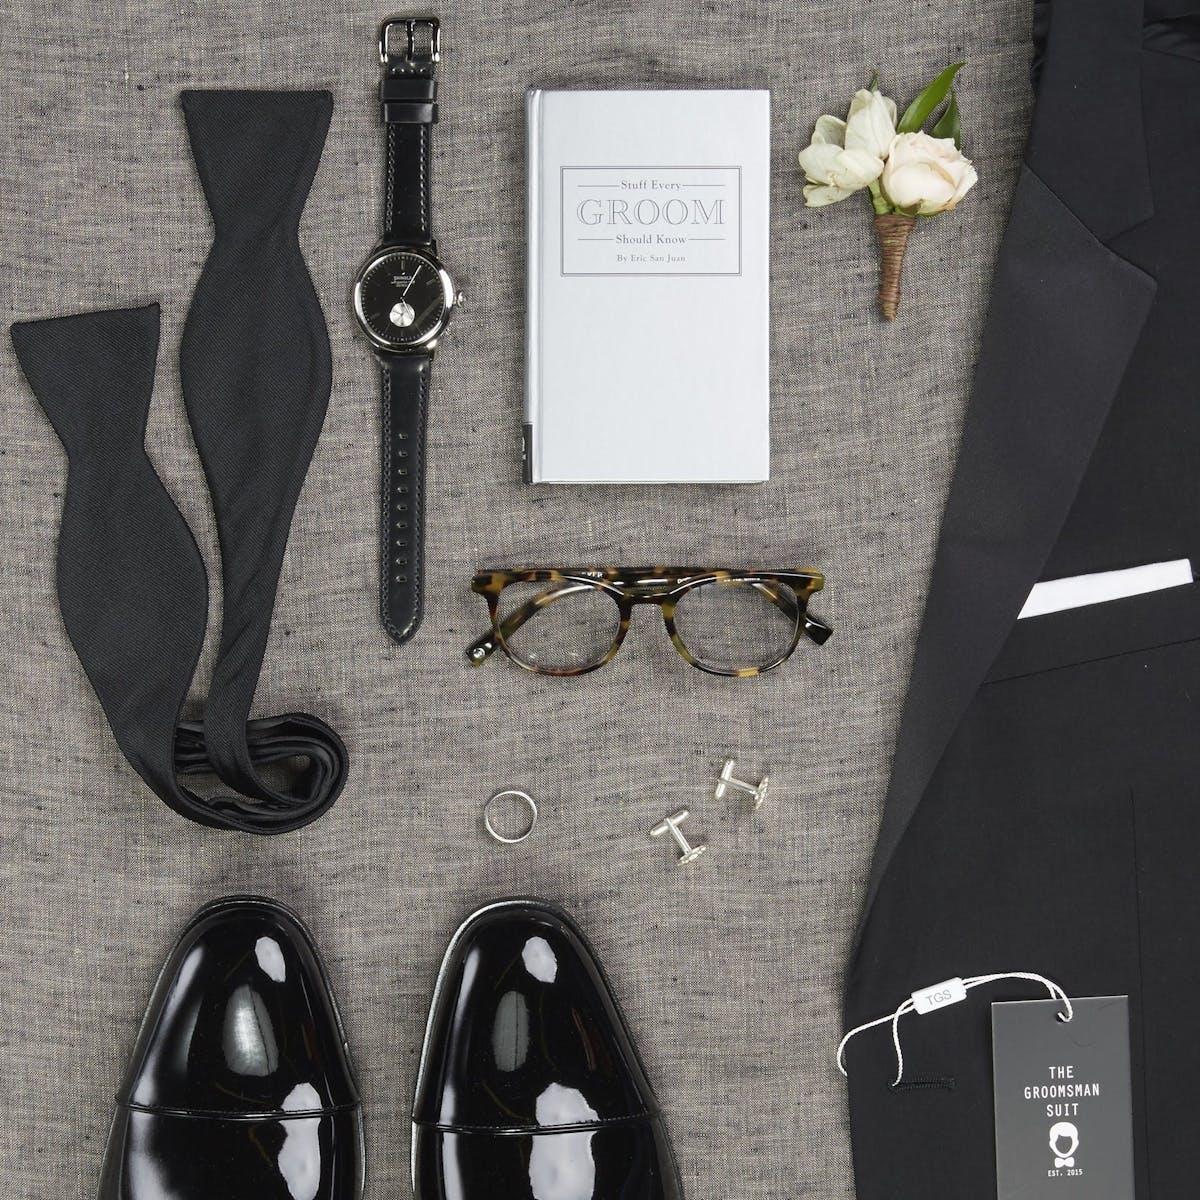 Wedding Planning Checklist for grooms to get groomsmen suited up in wedding suits for men.